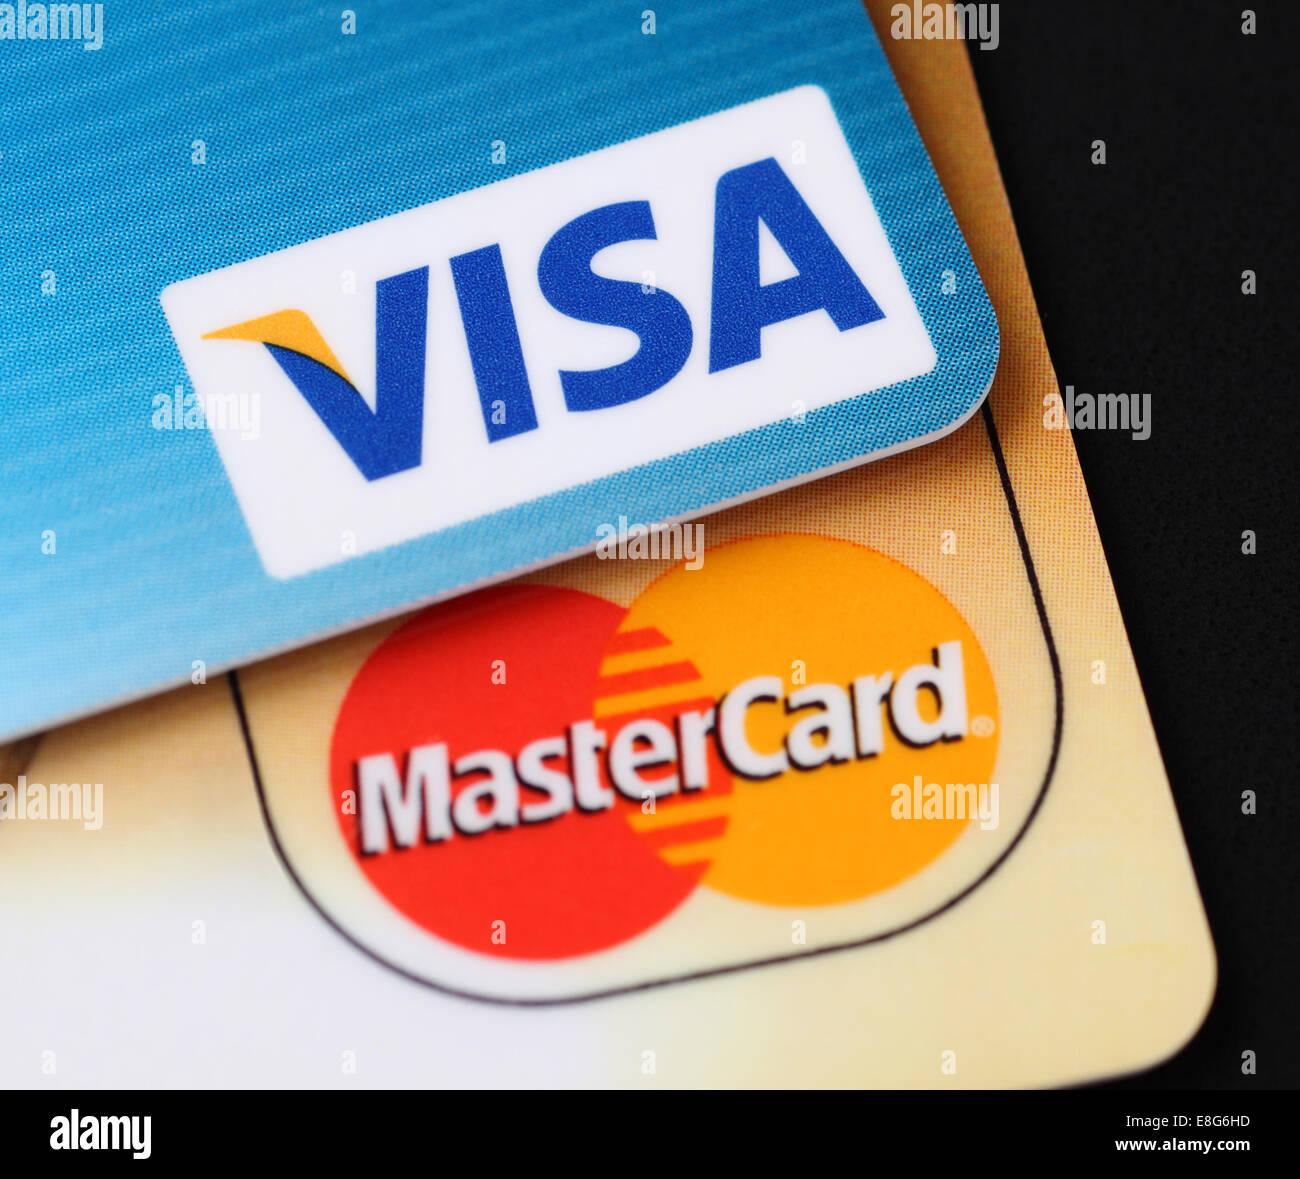 Tambov, Russian Federation - September 11, 2012 Visa and Mastercard logos on credit cards. Black background. Studio Stock Photo